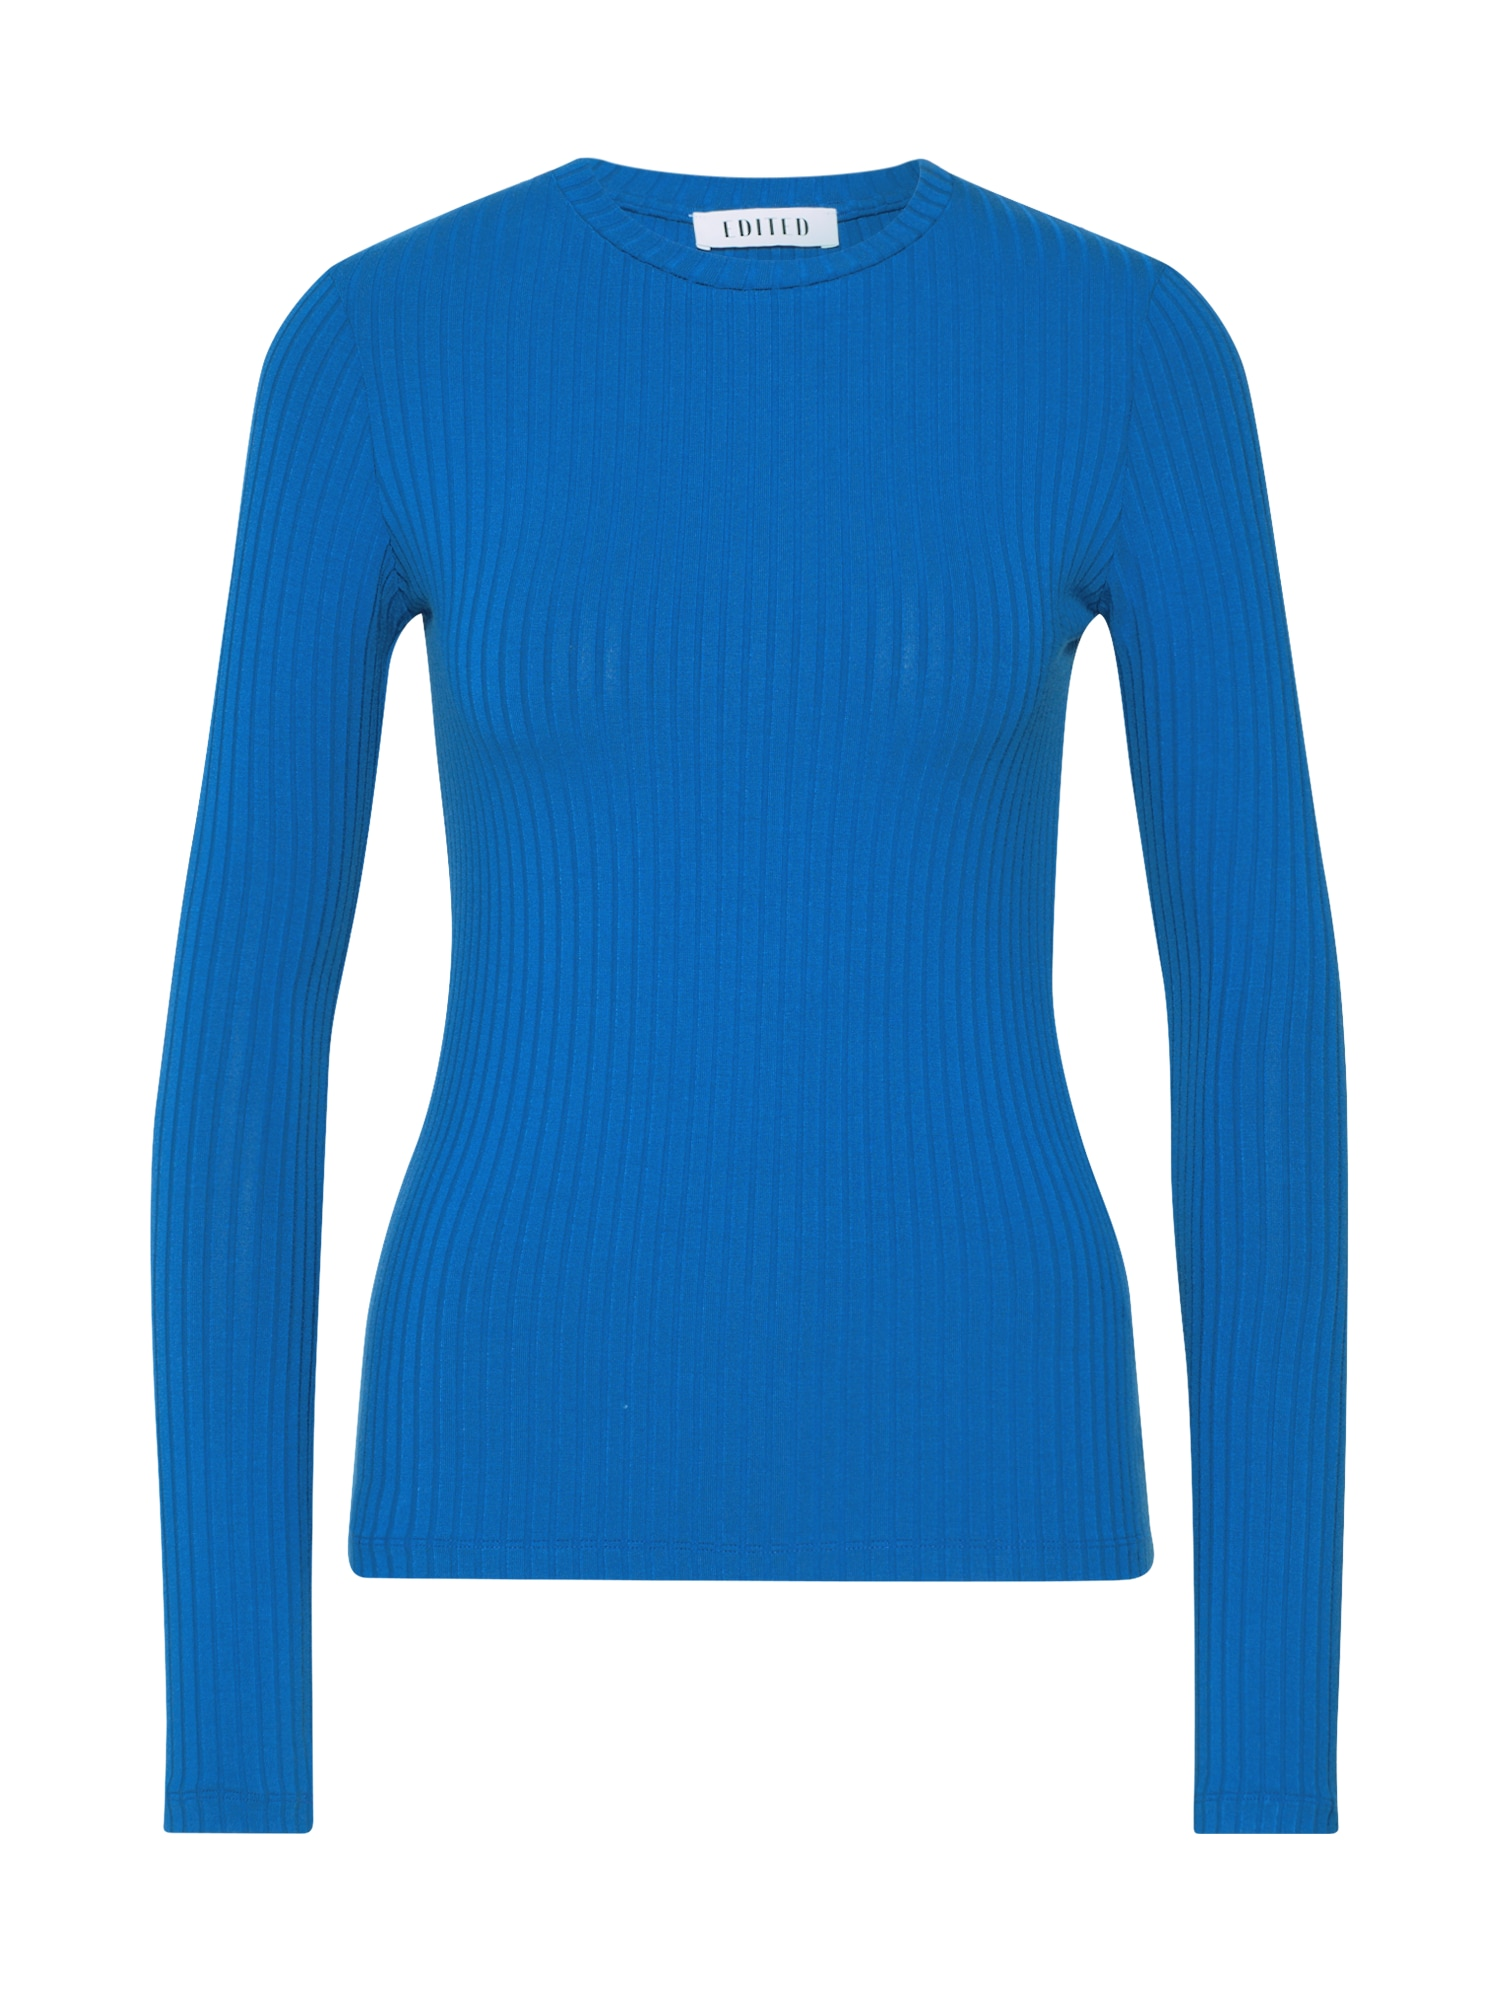 EDITED Marškinėliai 'Ginger' mėlyna